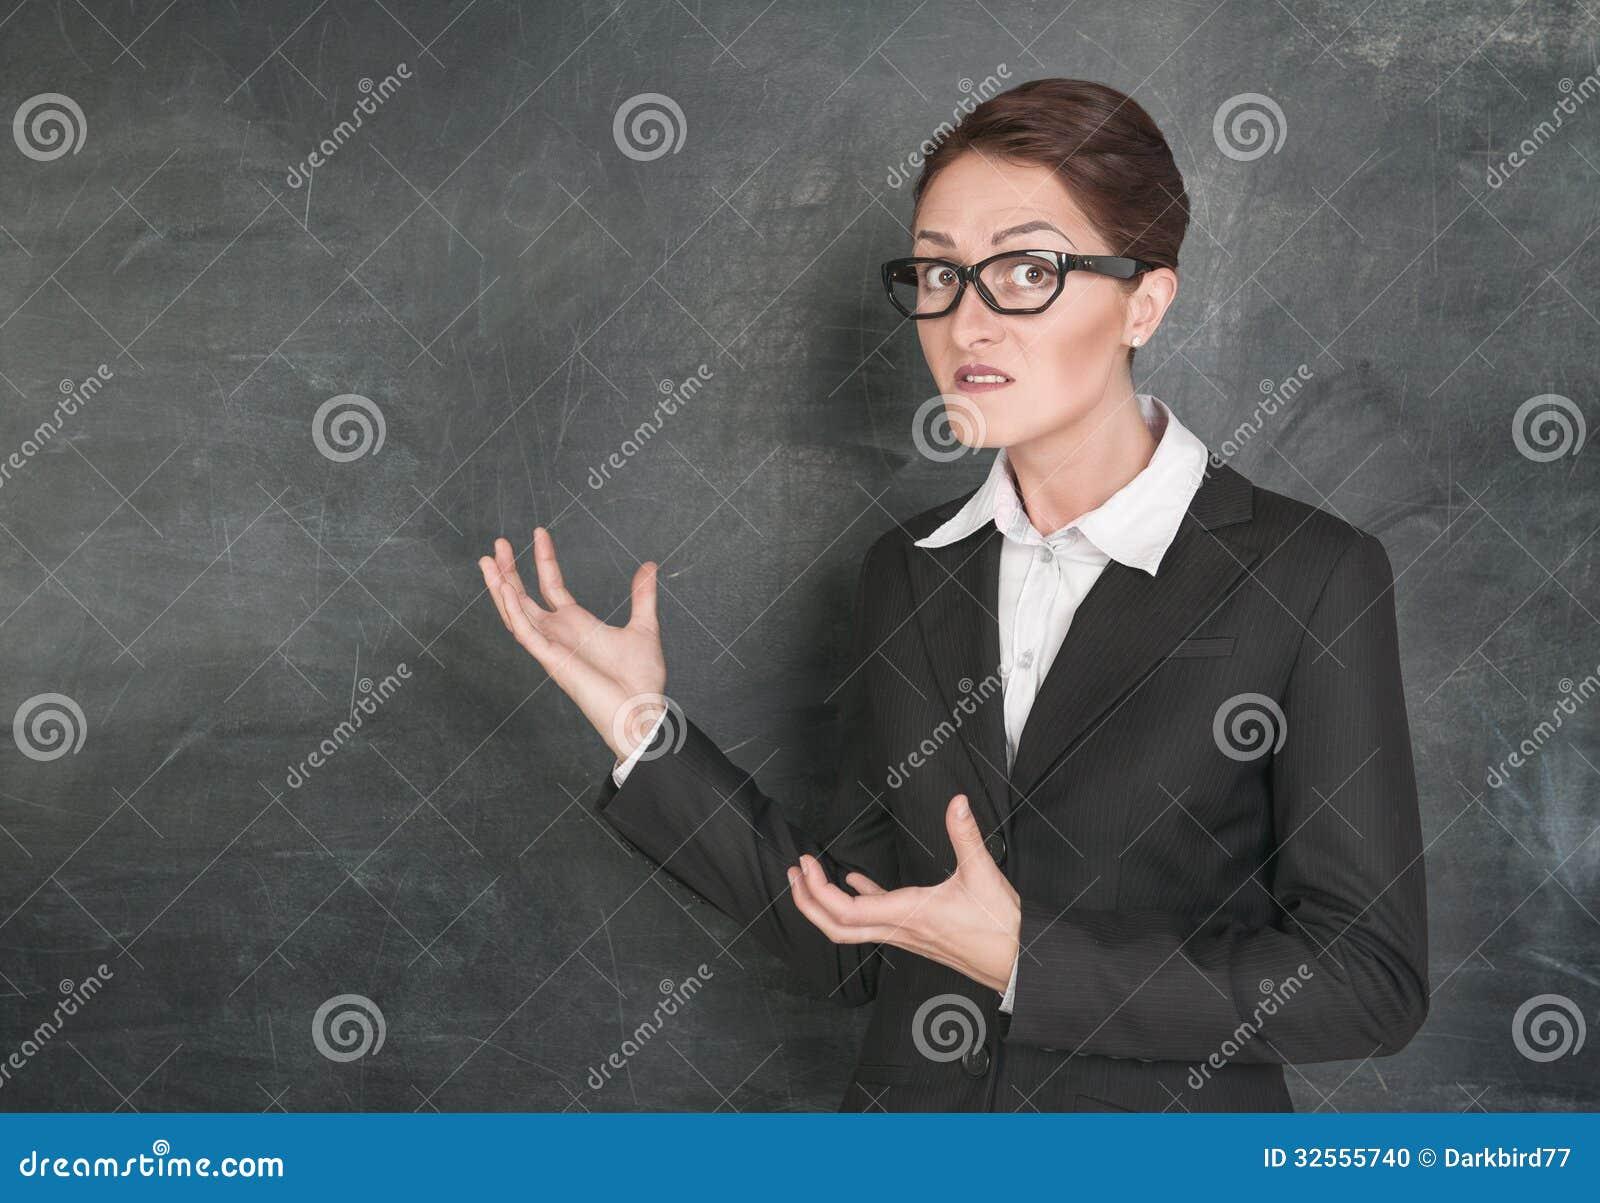 crazy teacher stock photo  image of rigorous  looking